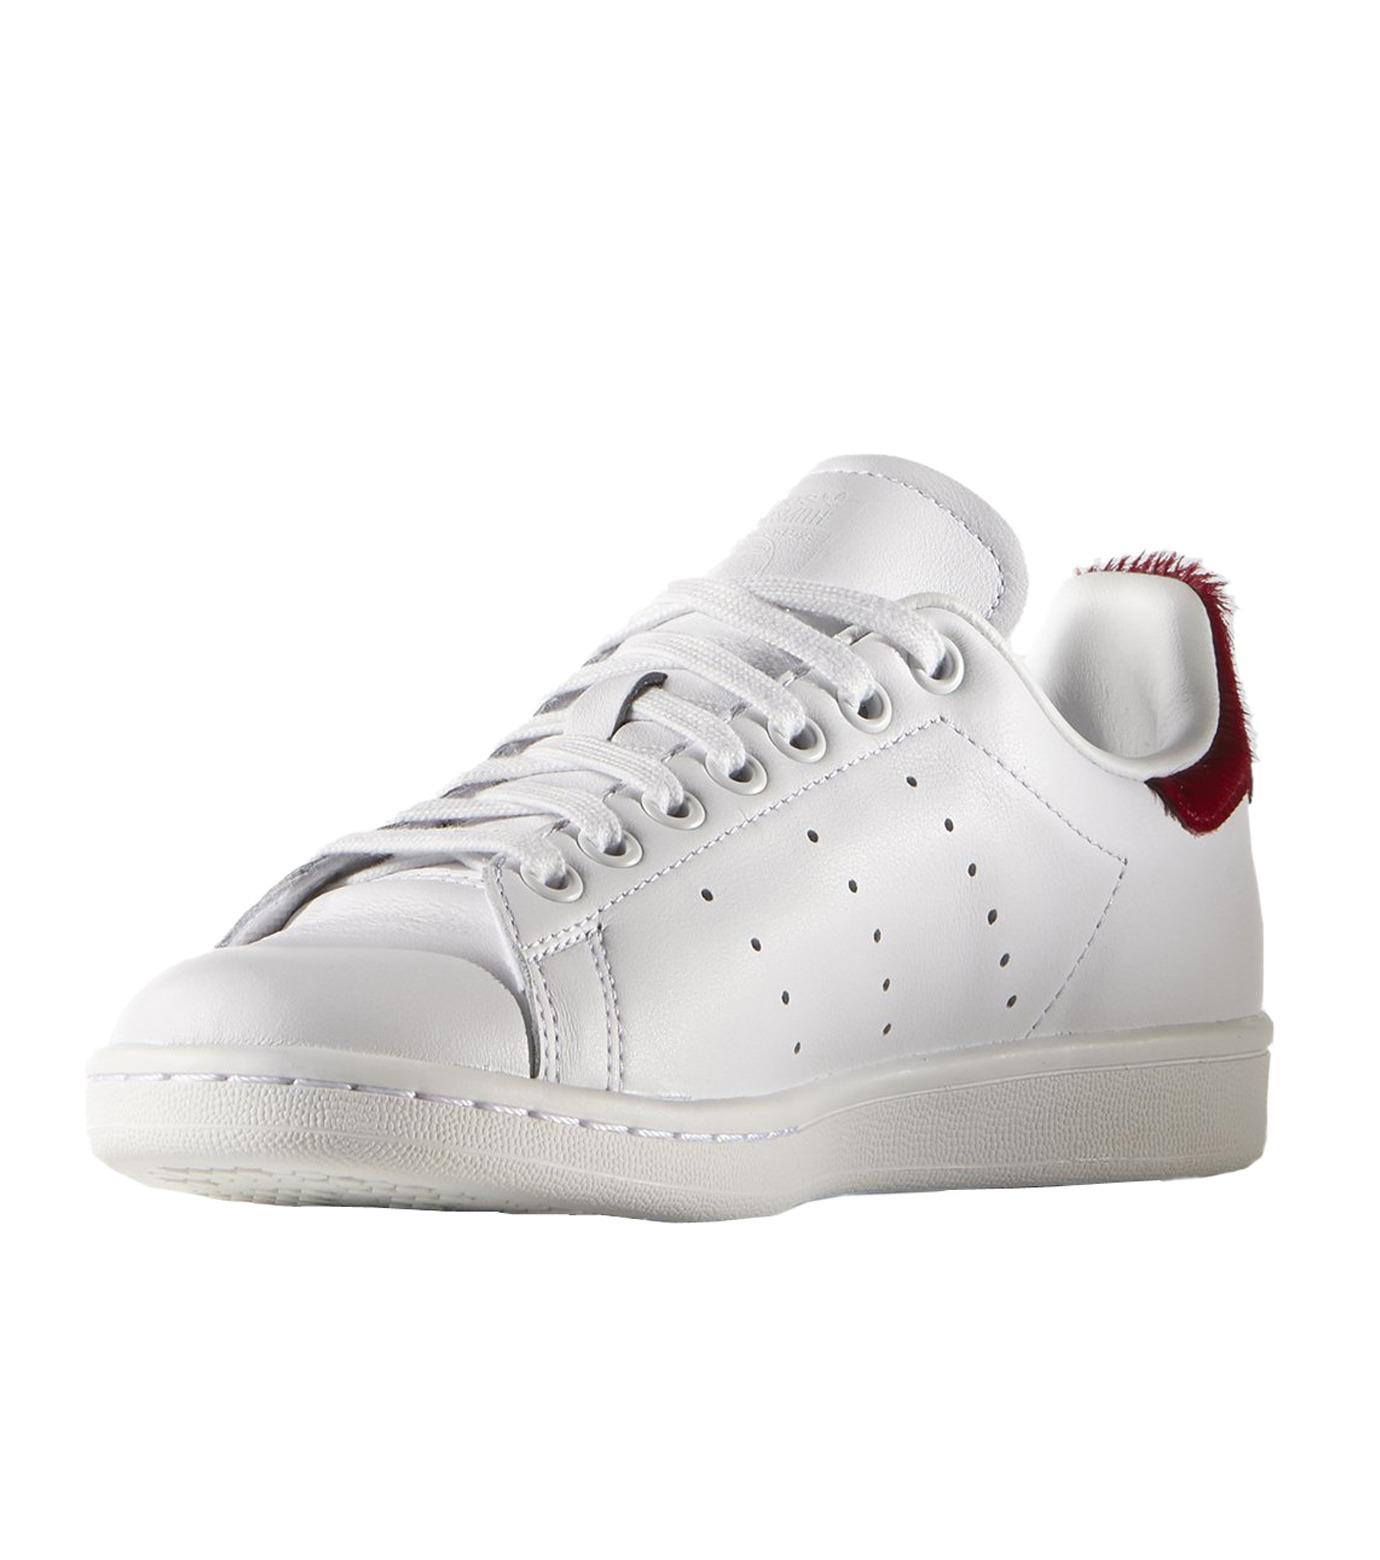 adidas(アディダス)のSTAN SMITH W-WHITE(シューズ/shoes)-S75562-4 拡大詳細画像3